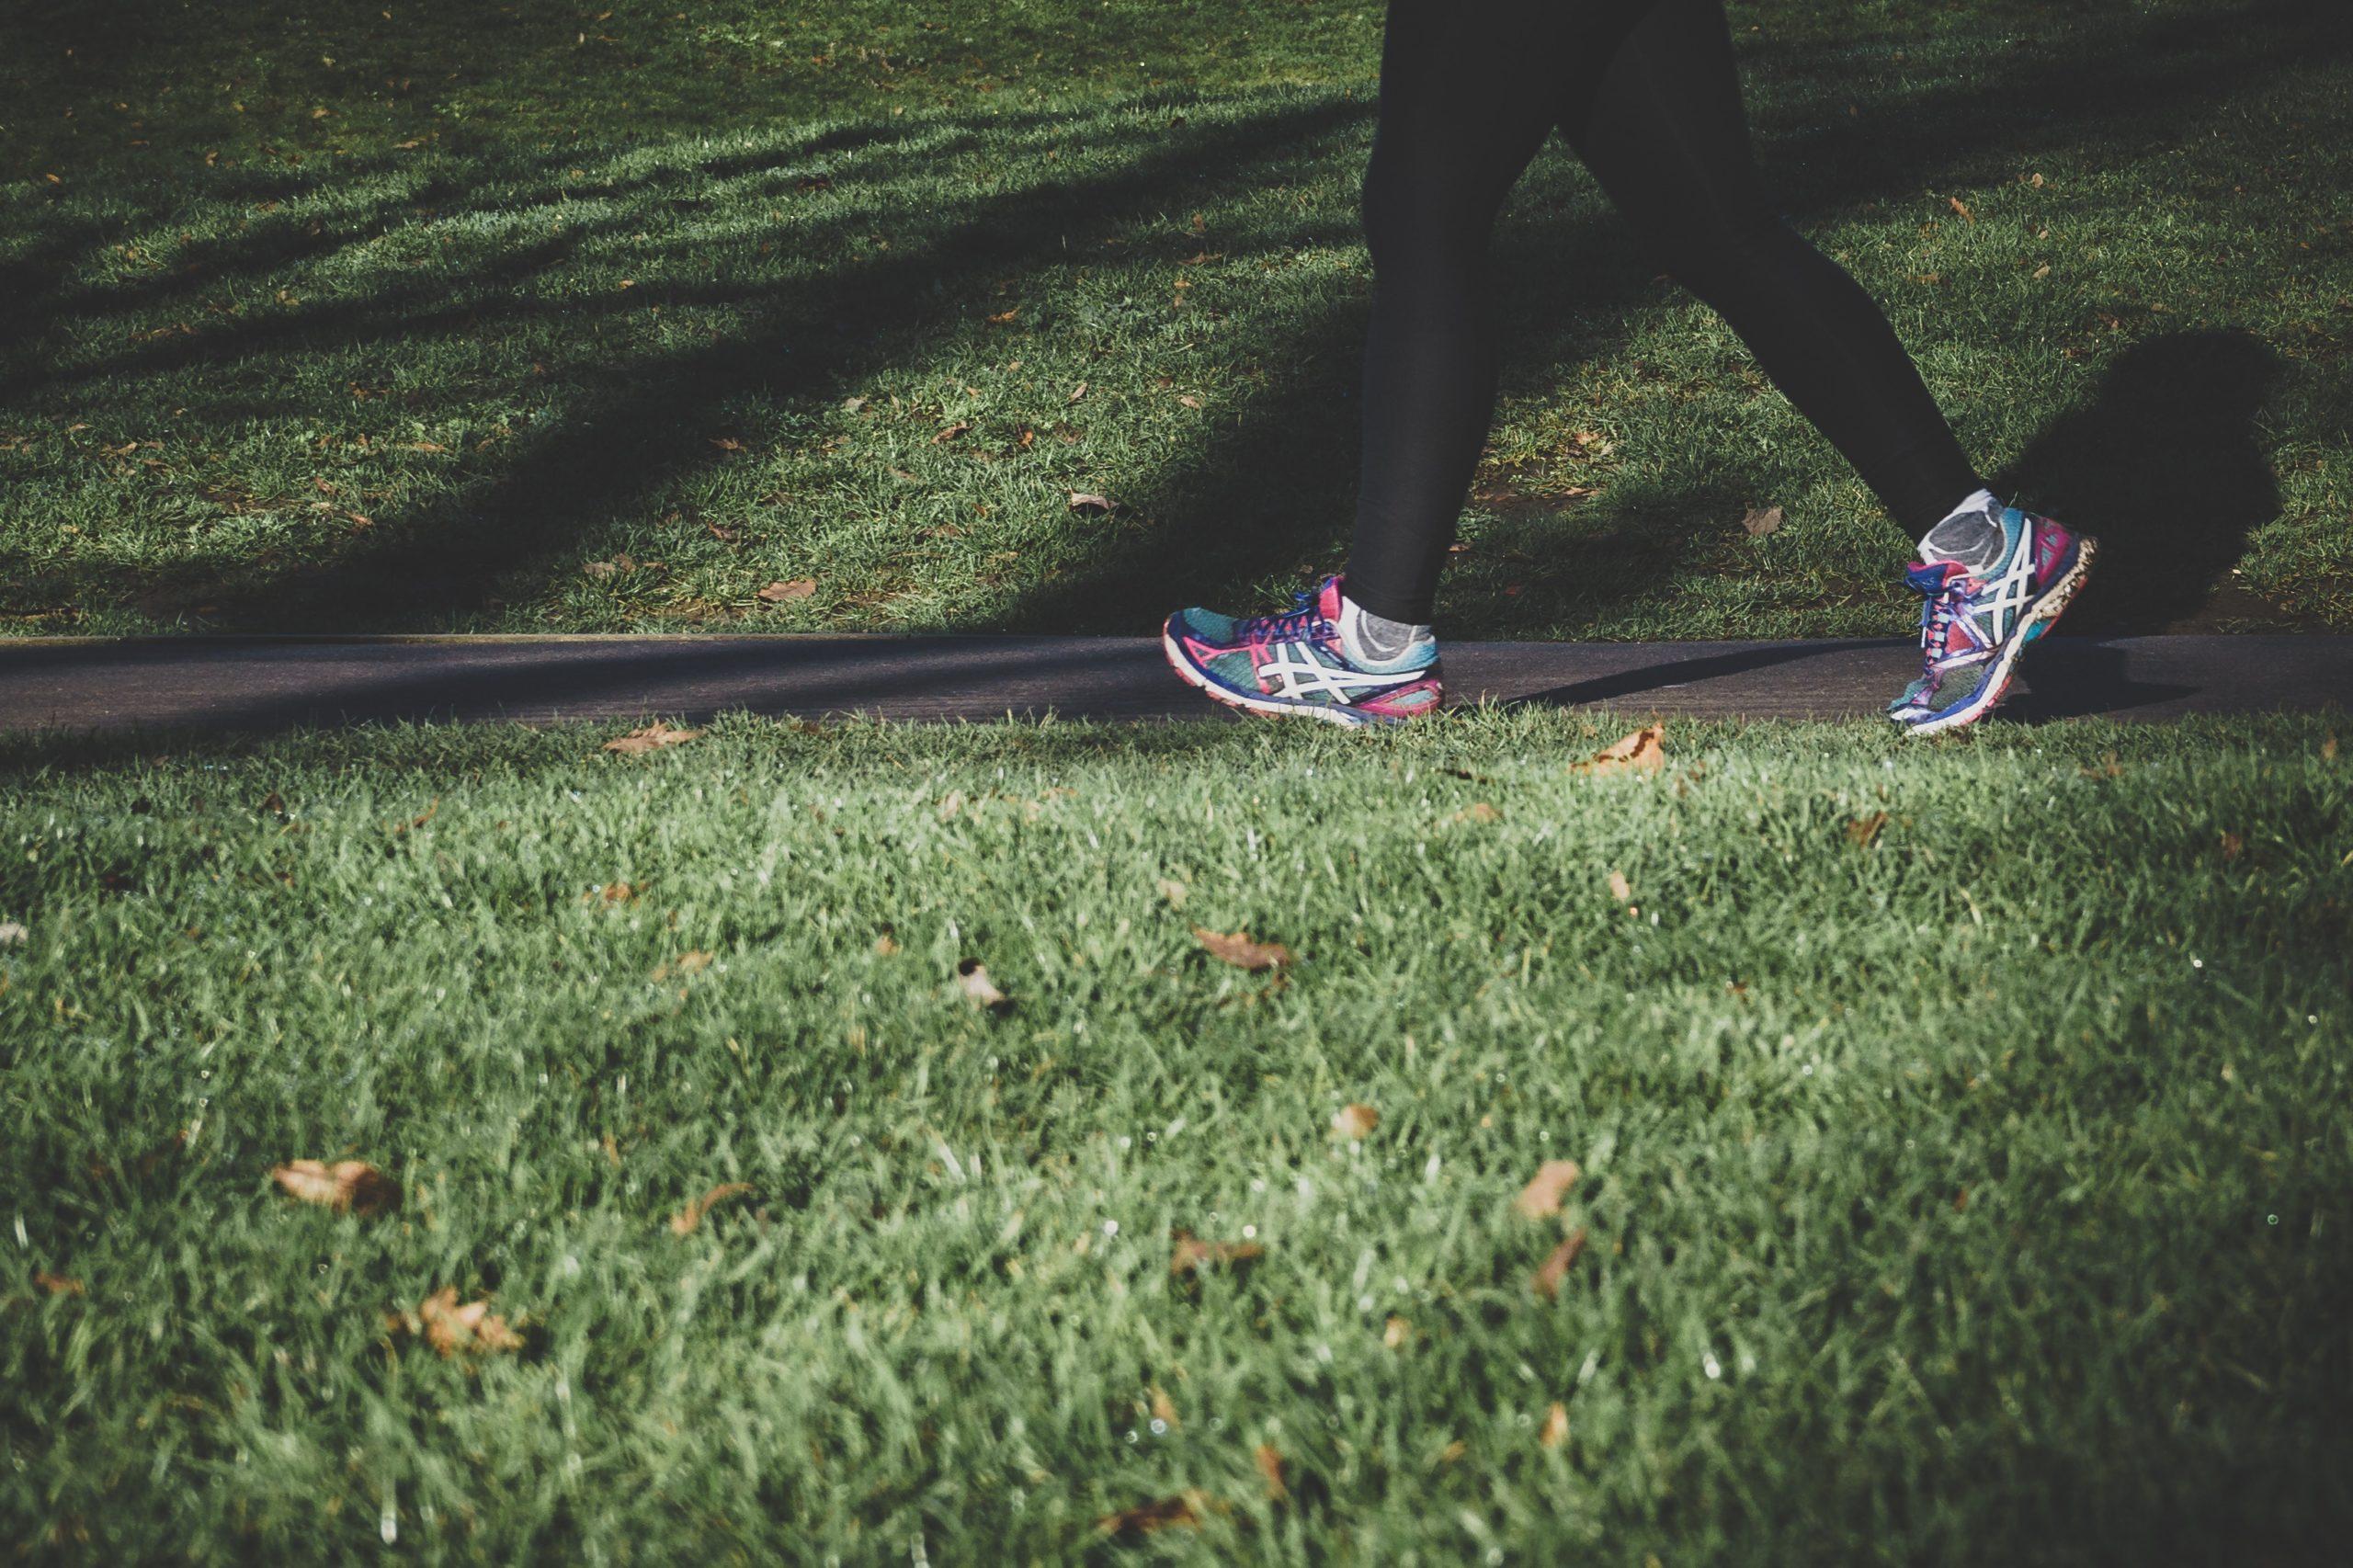 walk faster